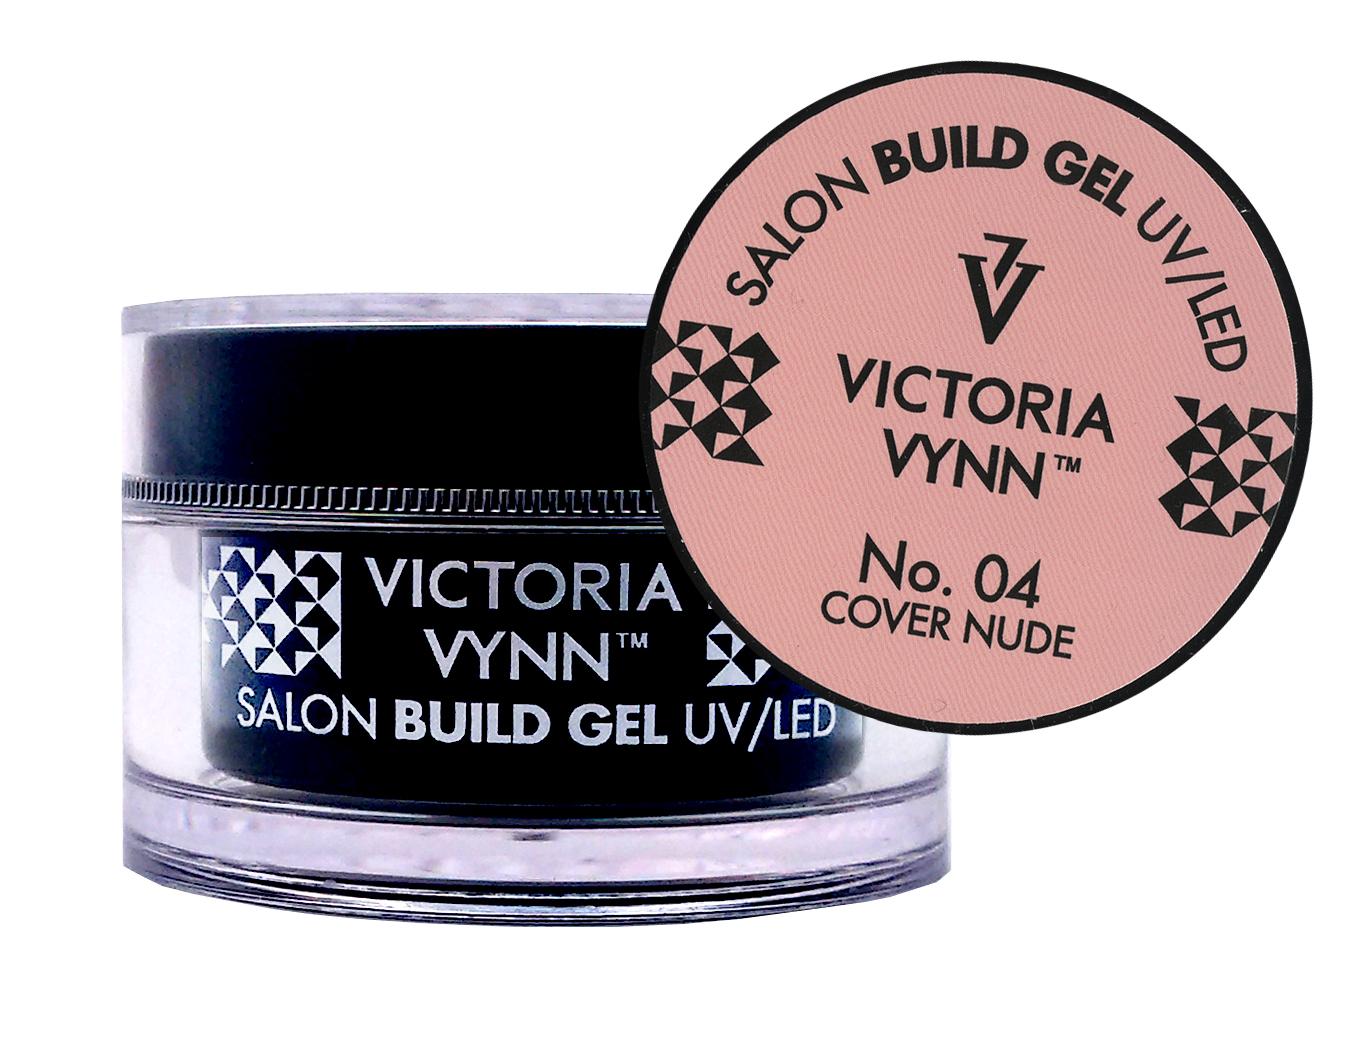 Żel budujący Victoria Vynn Cover Nude No.04 - Hurtownia